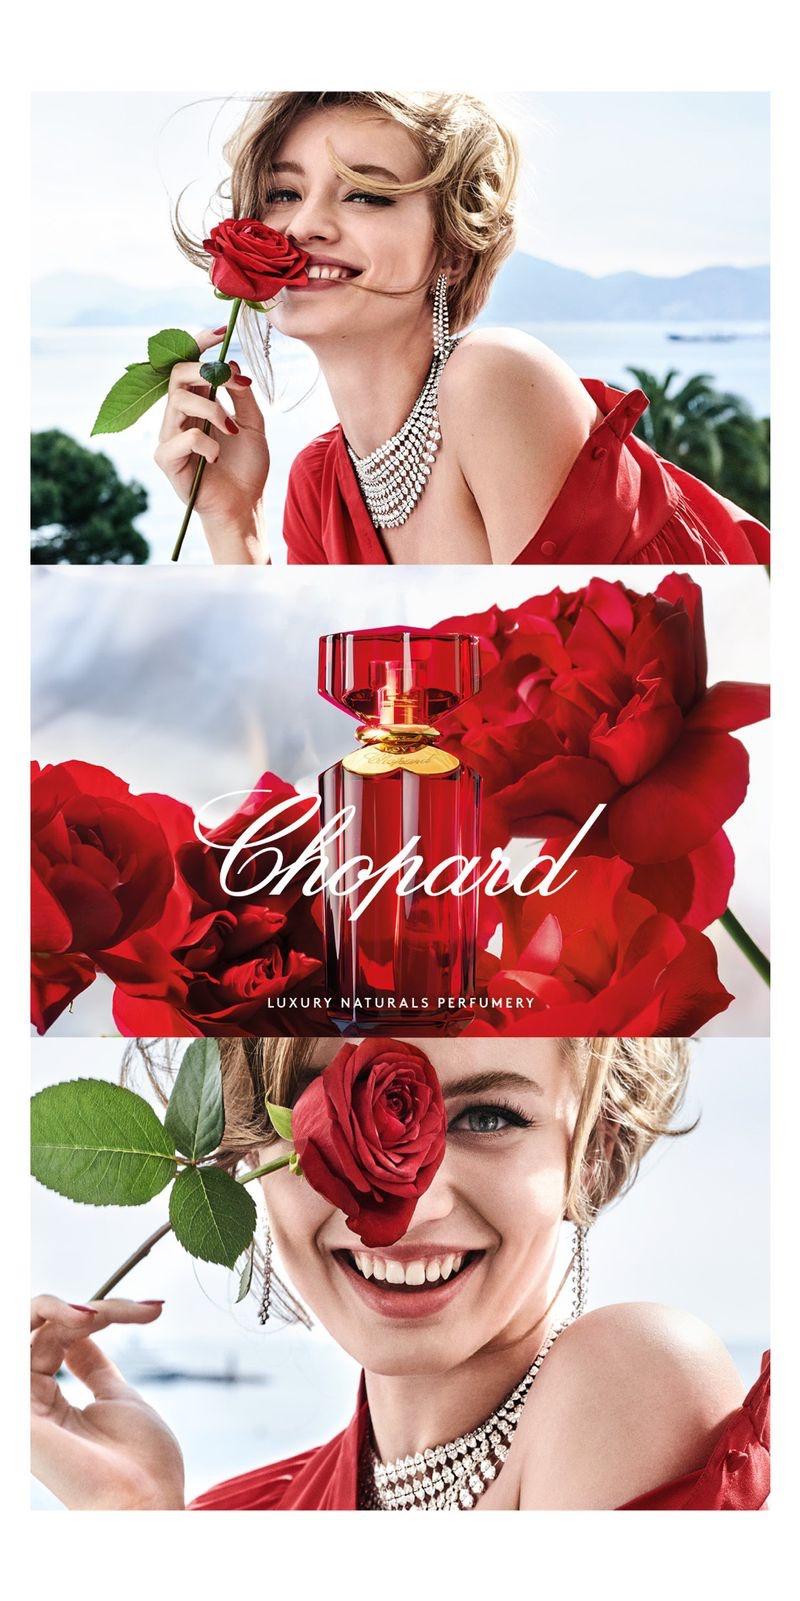 Chopard unveils Love Chopard perfume campaign